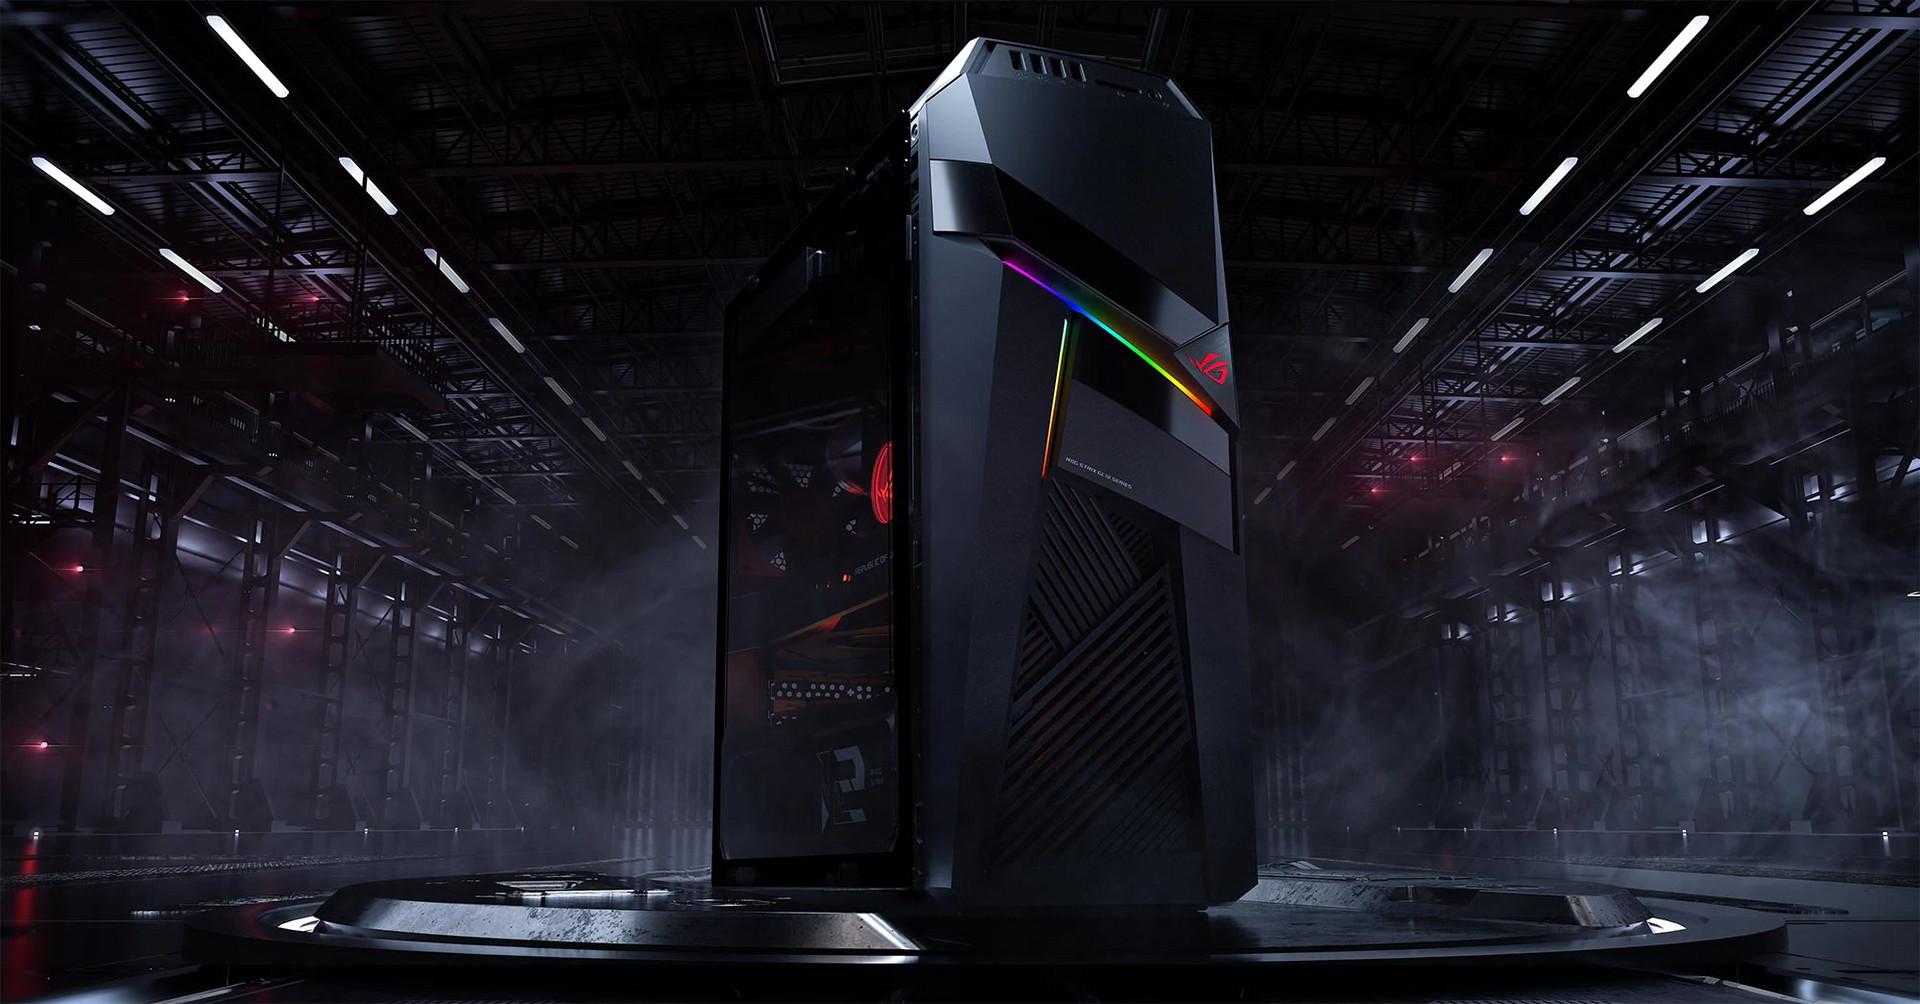 Asus introduces the ROG Strix GL12CX Gaming Desktop powered